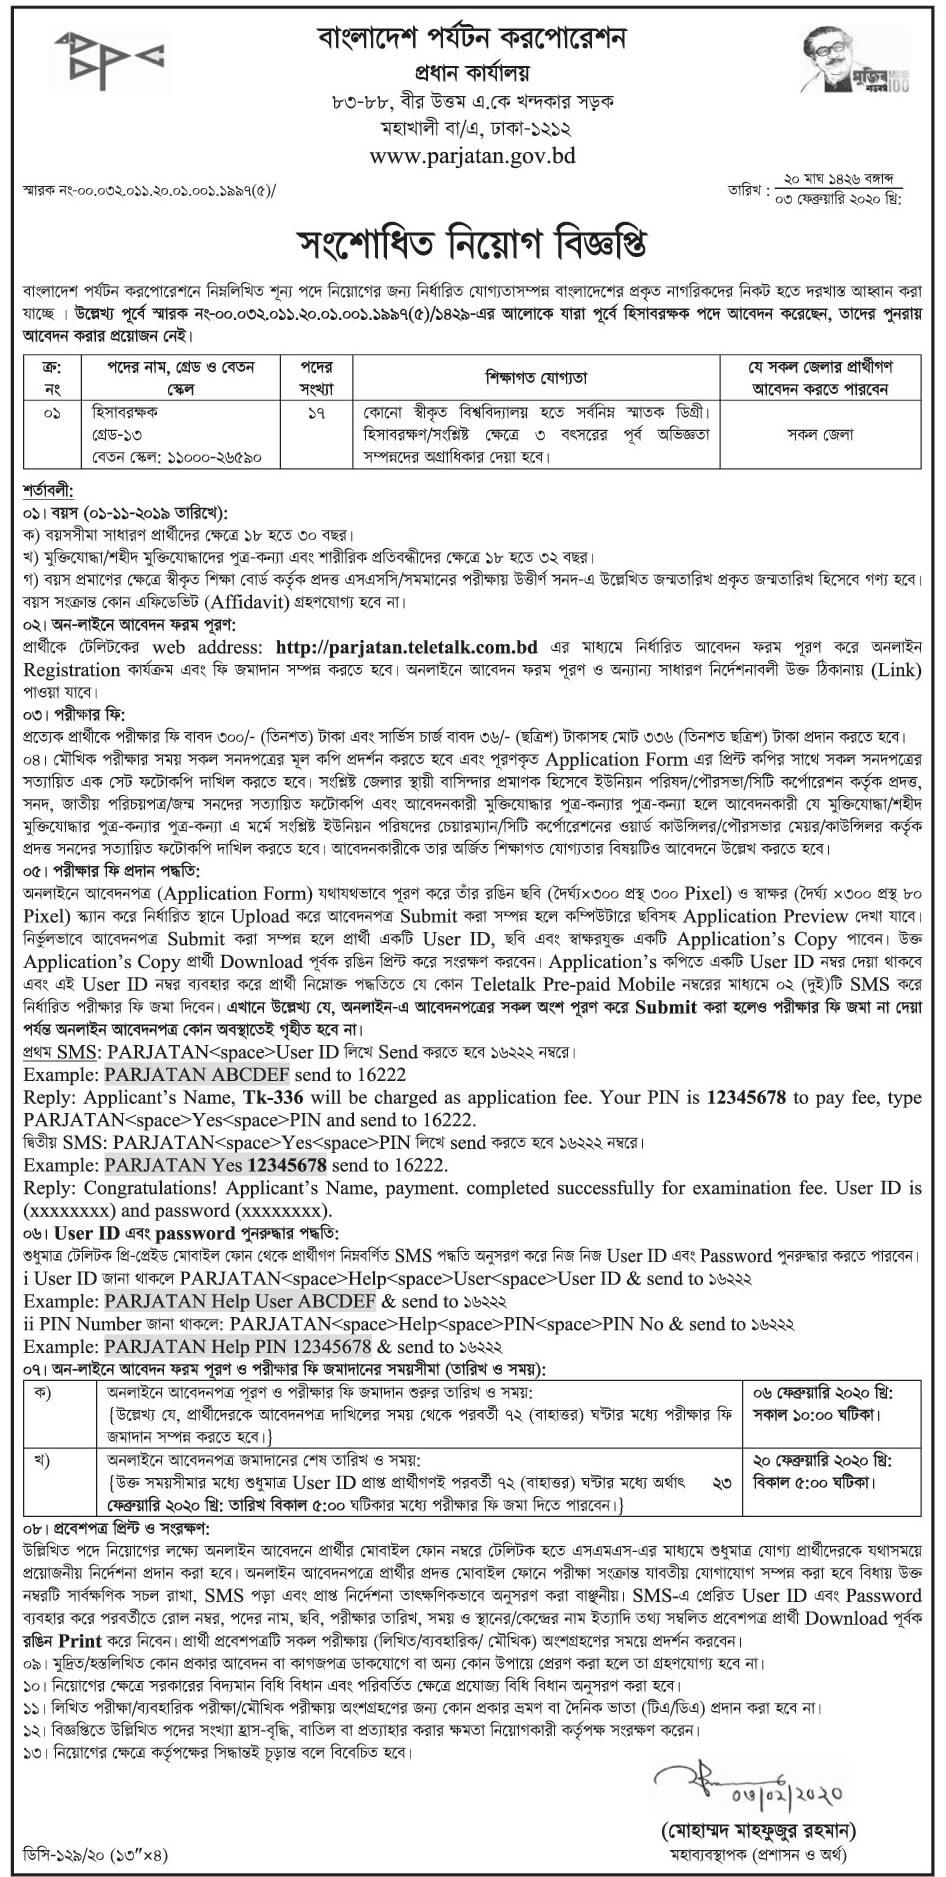 Parjatan Job Circular 2020 - parjatan.gov.bd